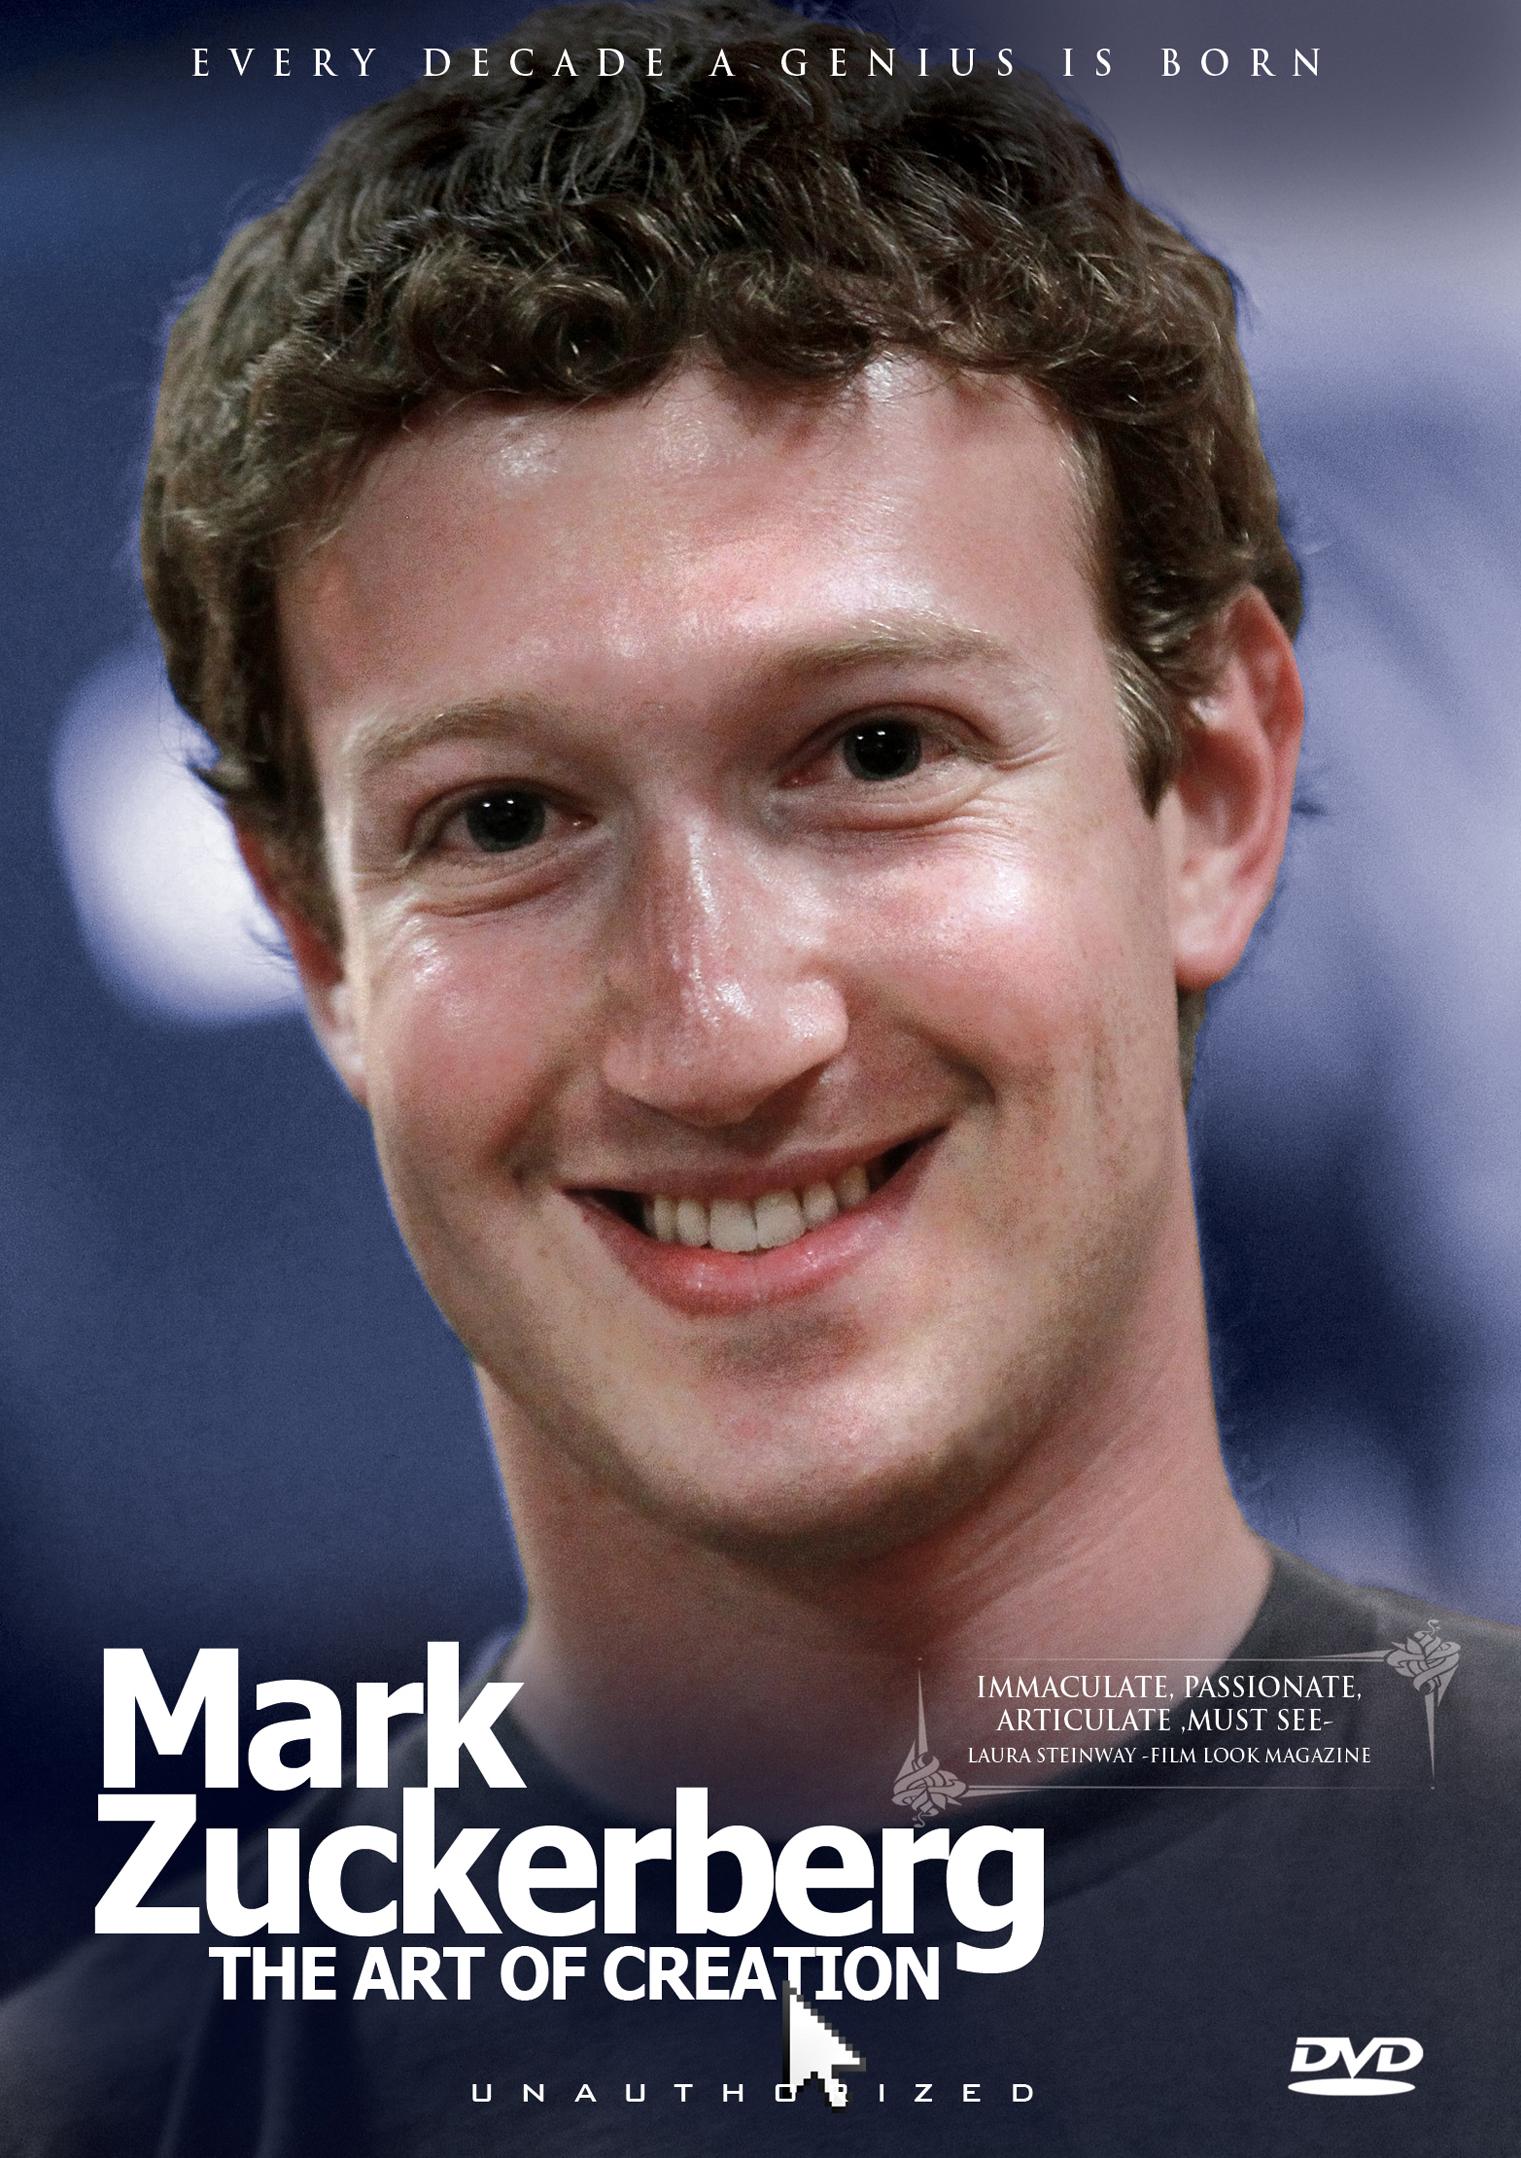 Mark Zuckerberg: The Art of Creation